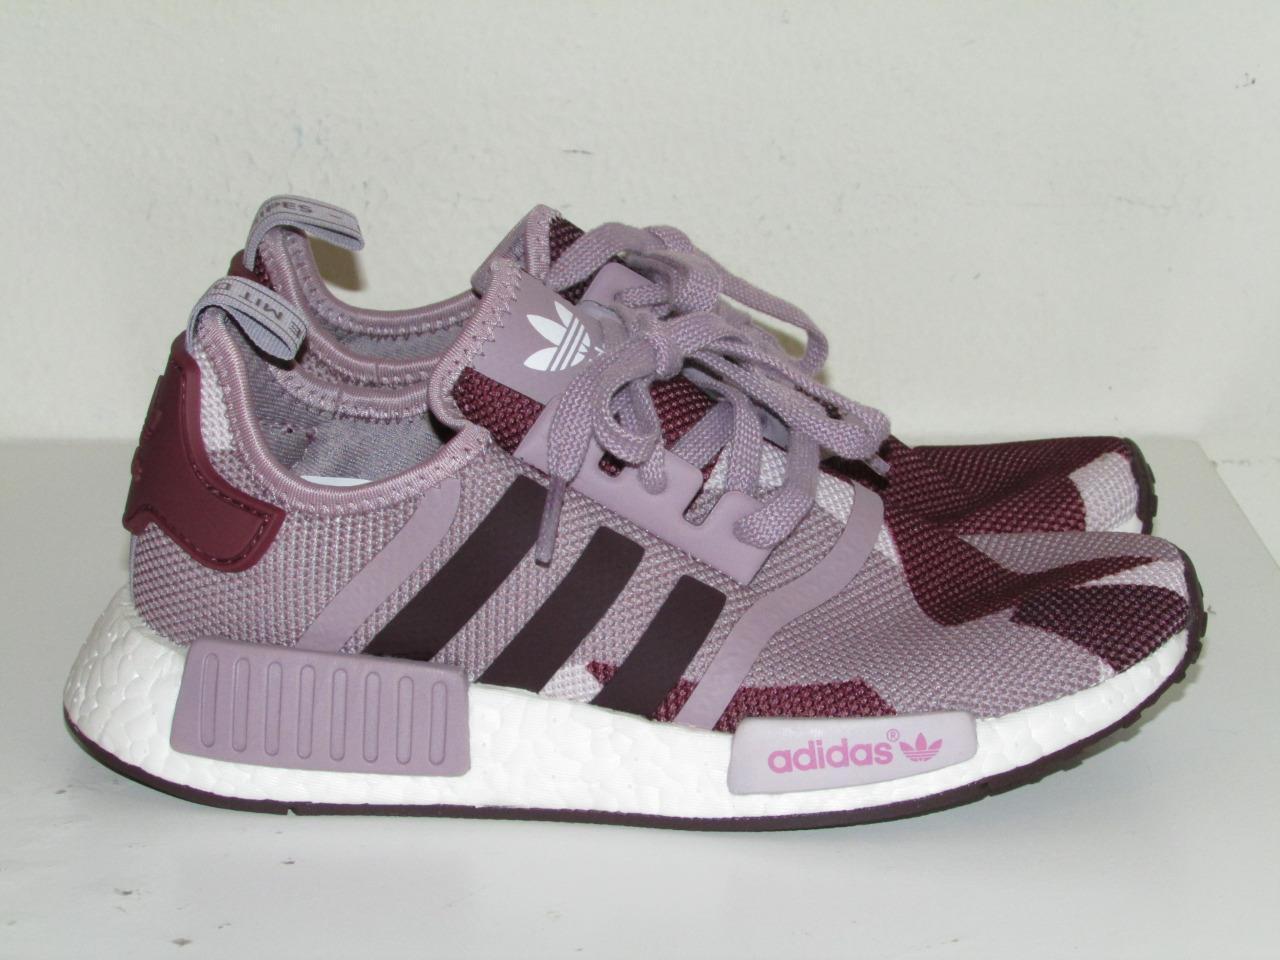 buy online 3395c 1e89f adidas nmd r1 purple